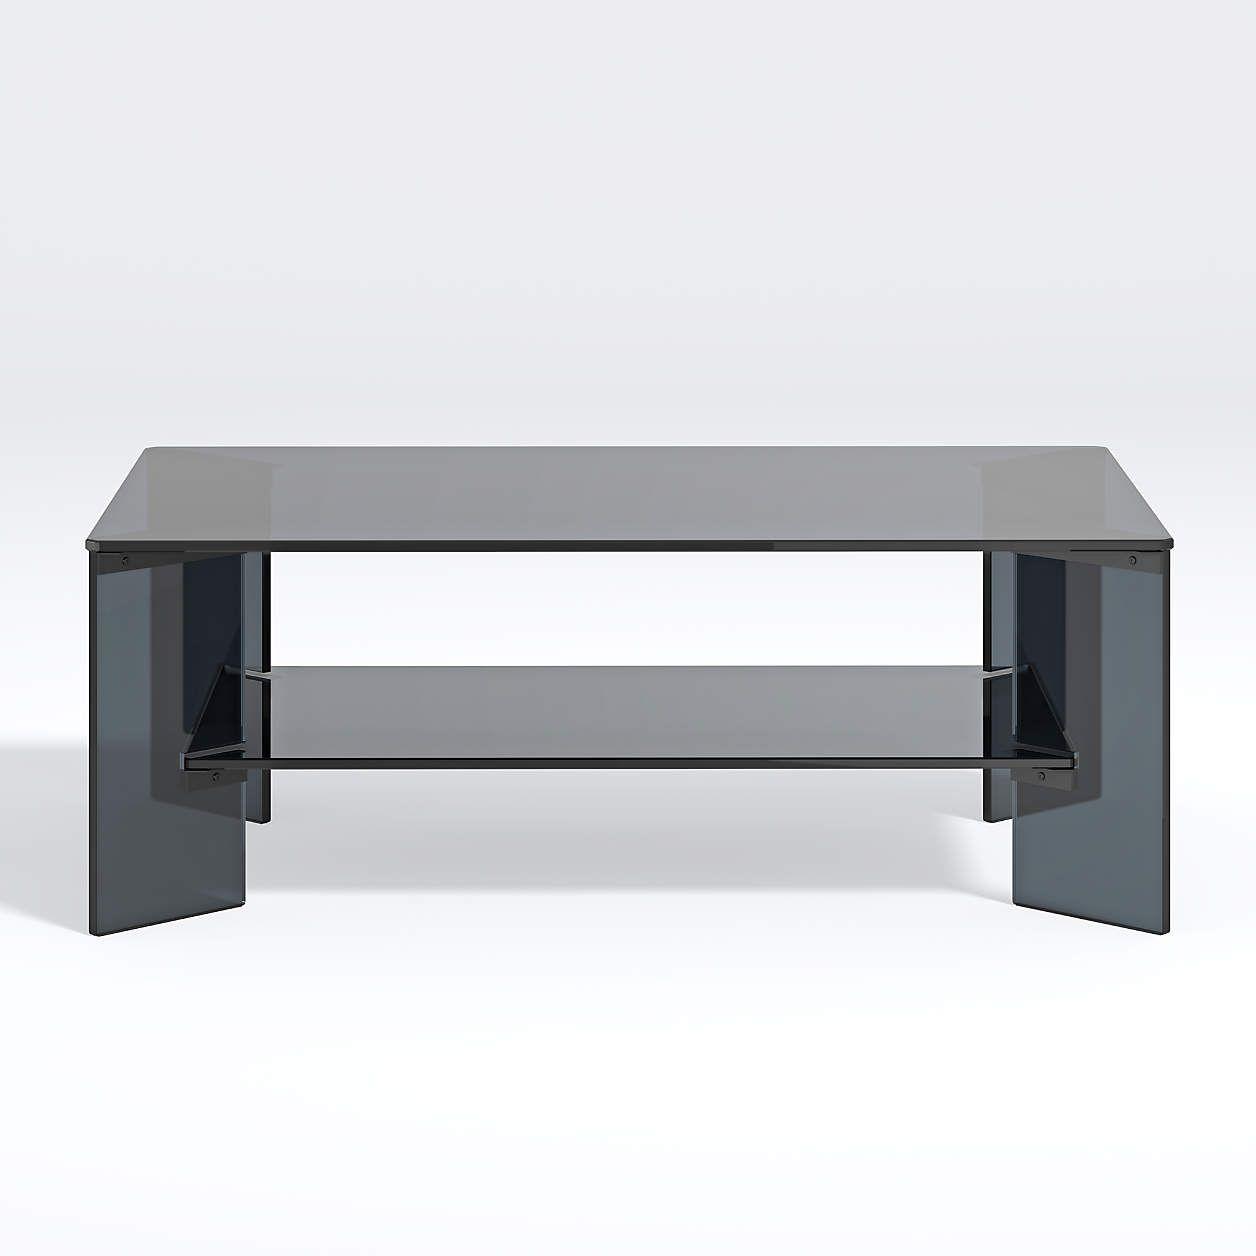 Miseur Rectangular Glass Coffee Table Reviews Crate And Barrel In 2021 Rectangular Glass Coffee Table Coffee Table Crate And Barrel Glass Coffee Table [ 1256 x 1256 Pixel ]